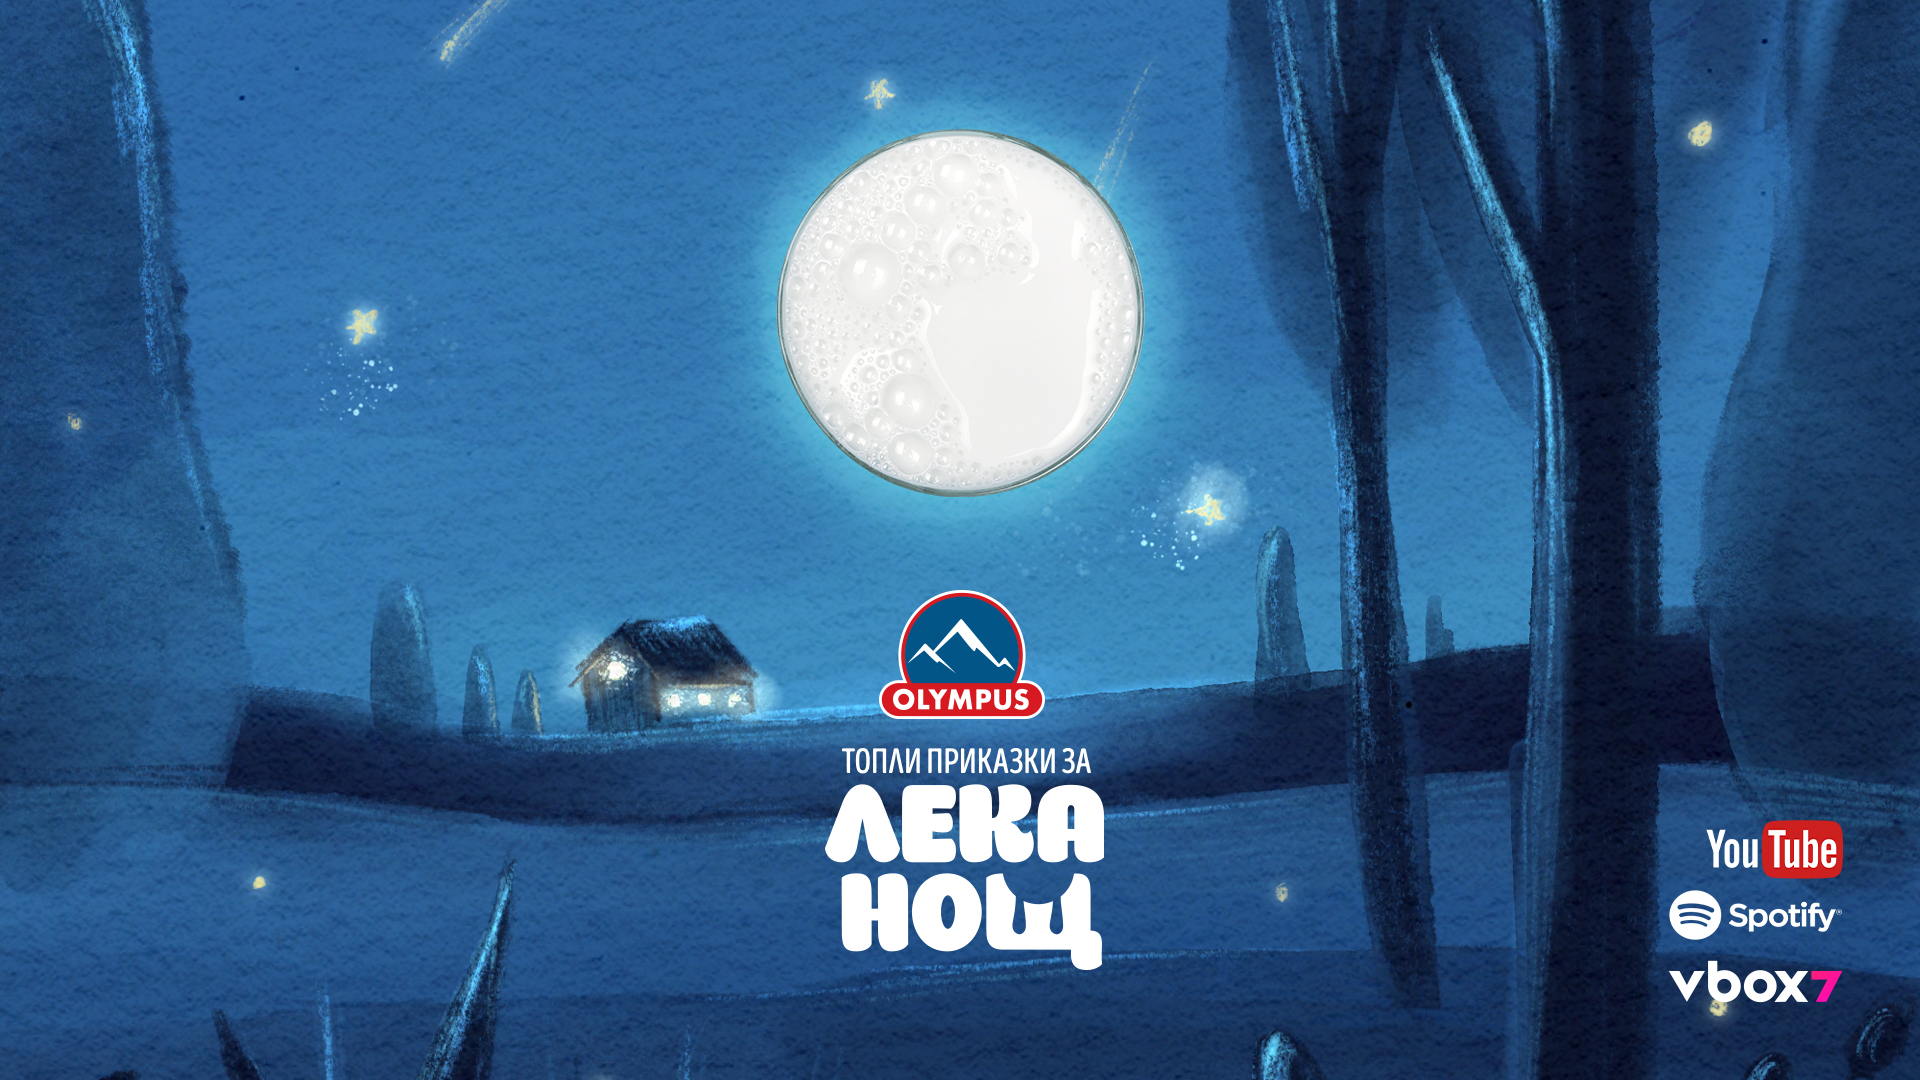 Campaign detail image